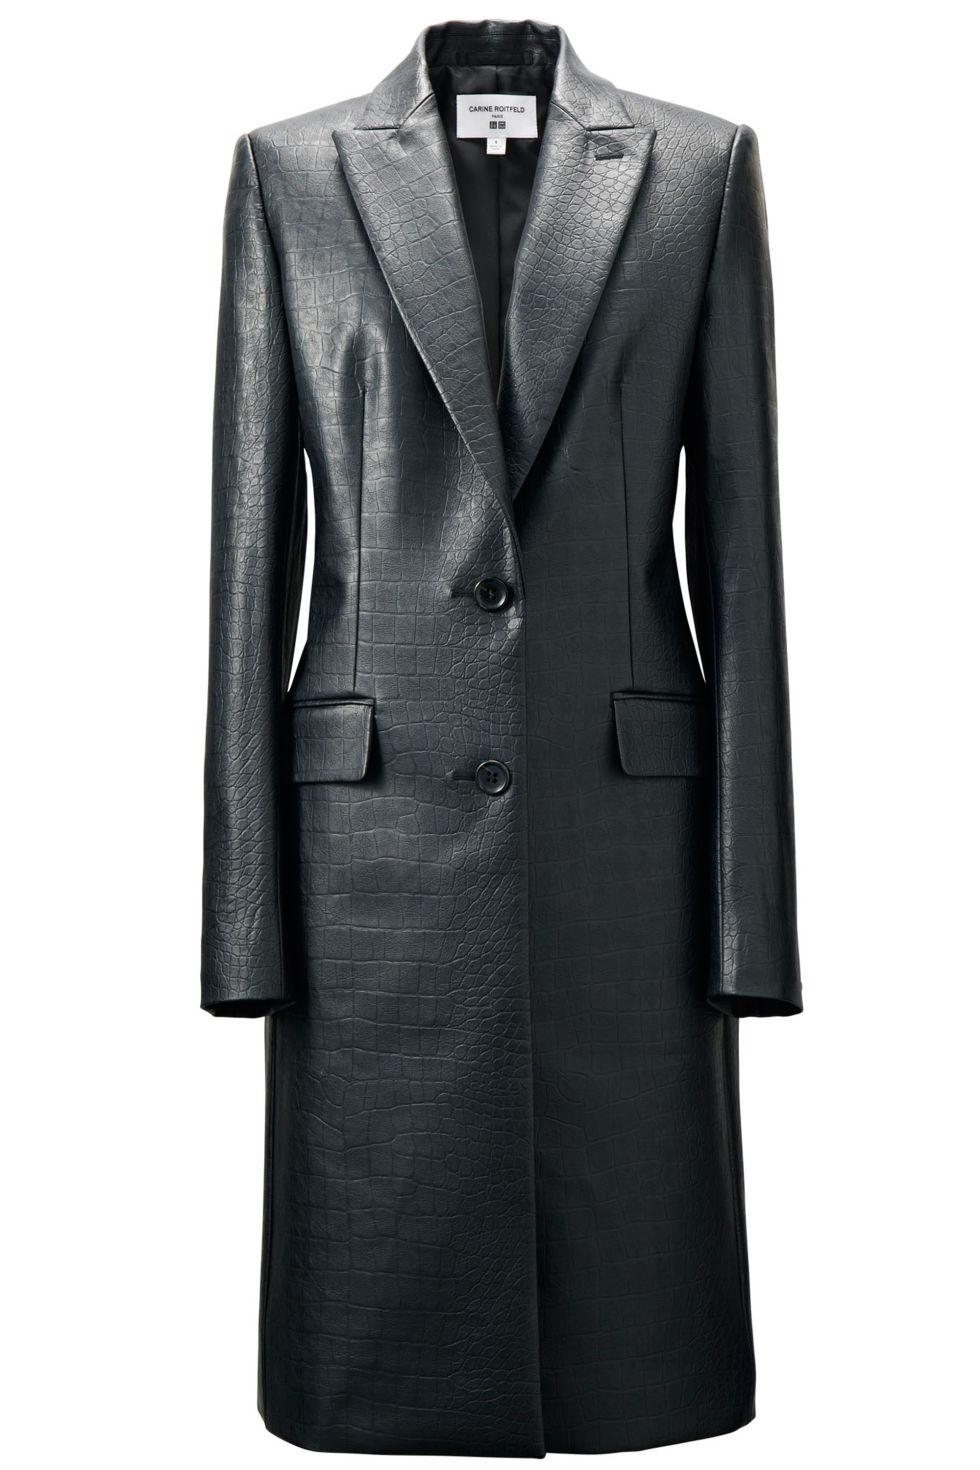 Leather jacket uniqlo - Leather Jacket Uniqlo 44